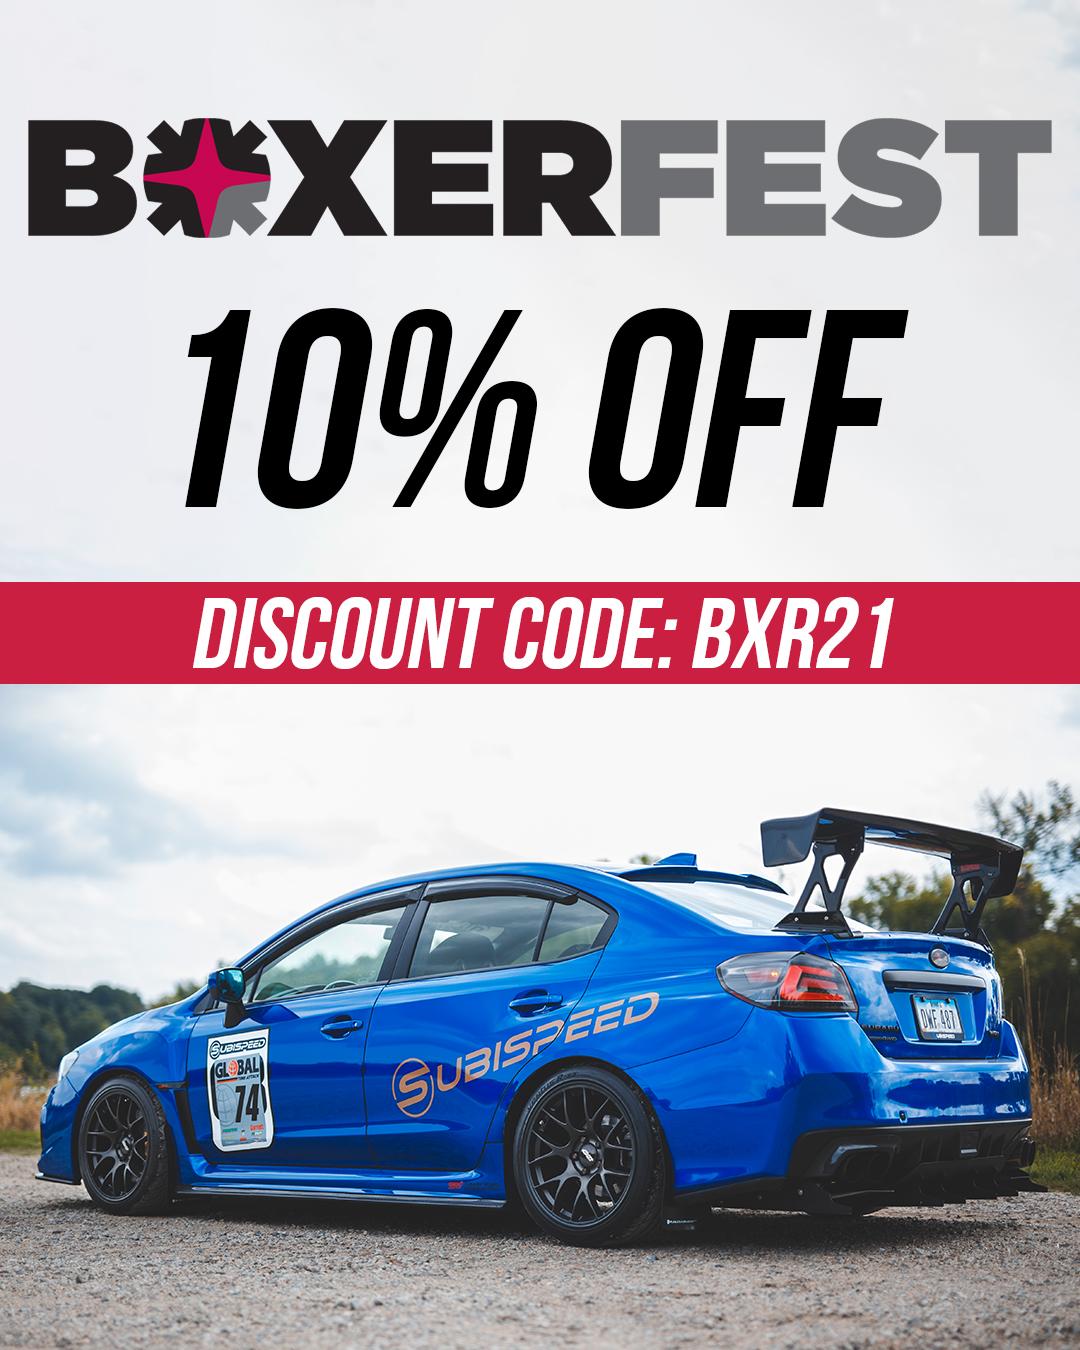 use code BXR21